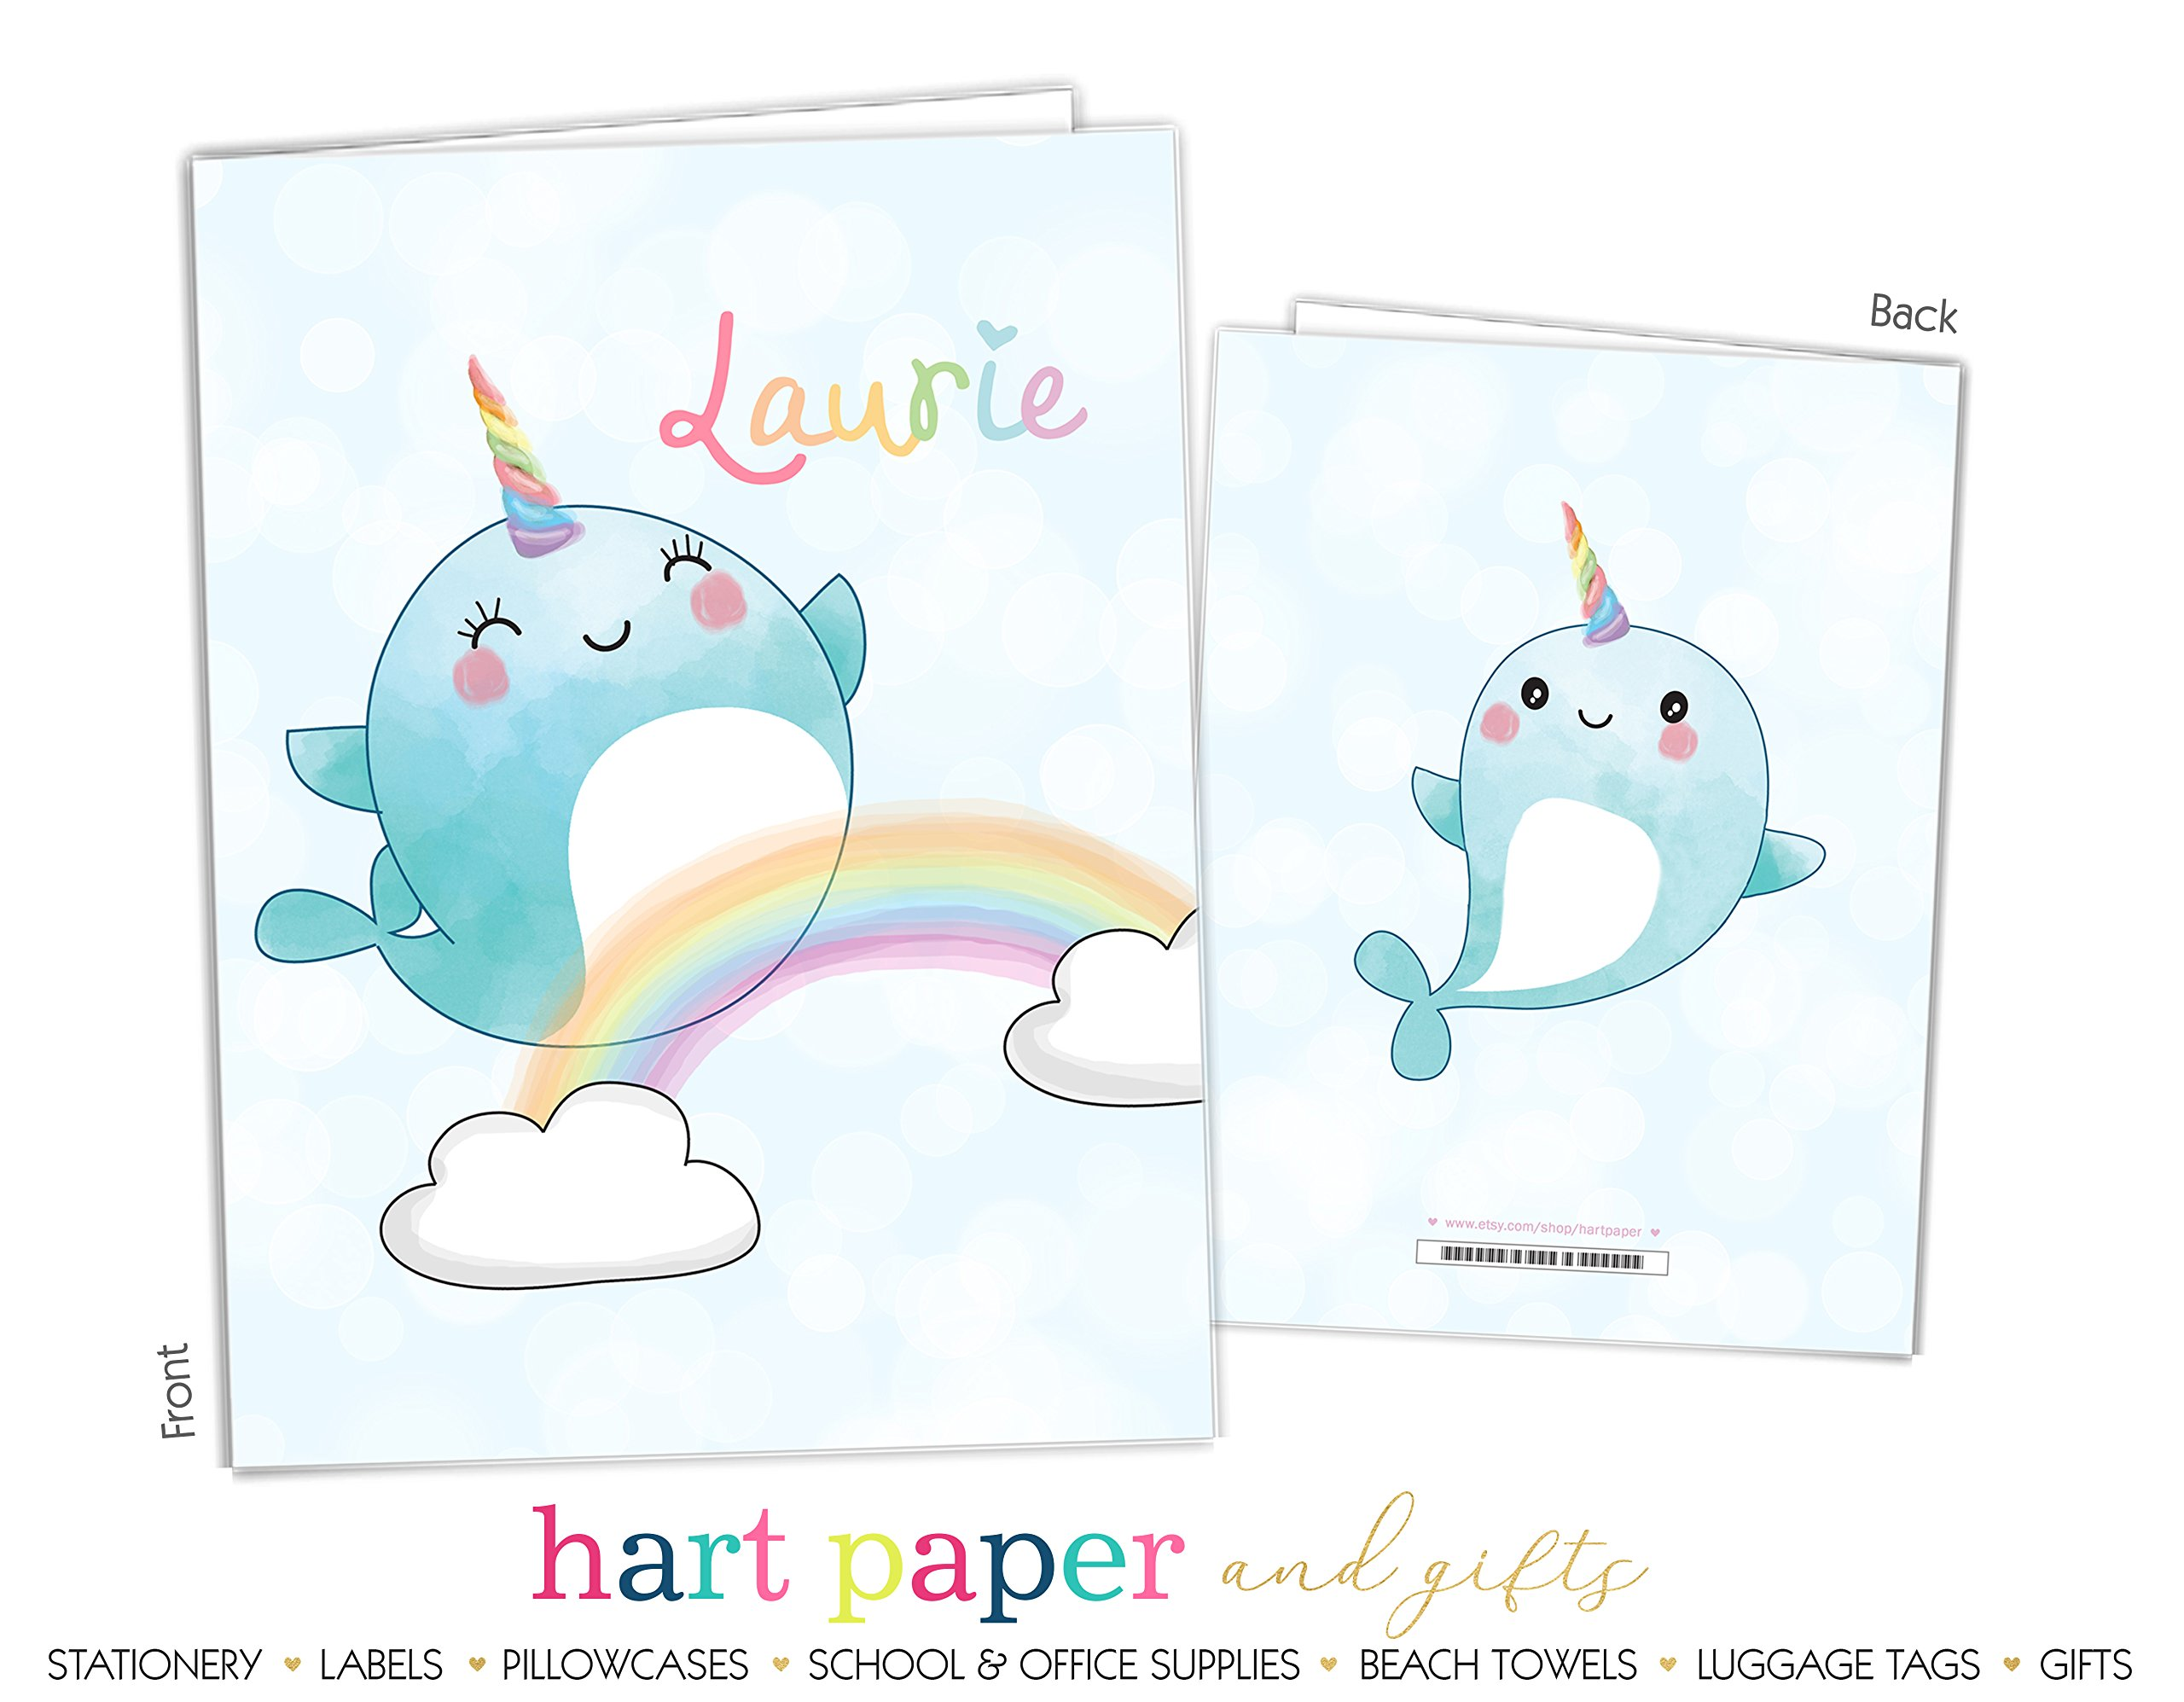 Rainbow Narwhal Sea Unicorn 2 Pocket Folder Gift Name Back to School Supplies Teacher Office Birthday Girl Boy Adult Kids Custom Personalized Custom